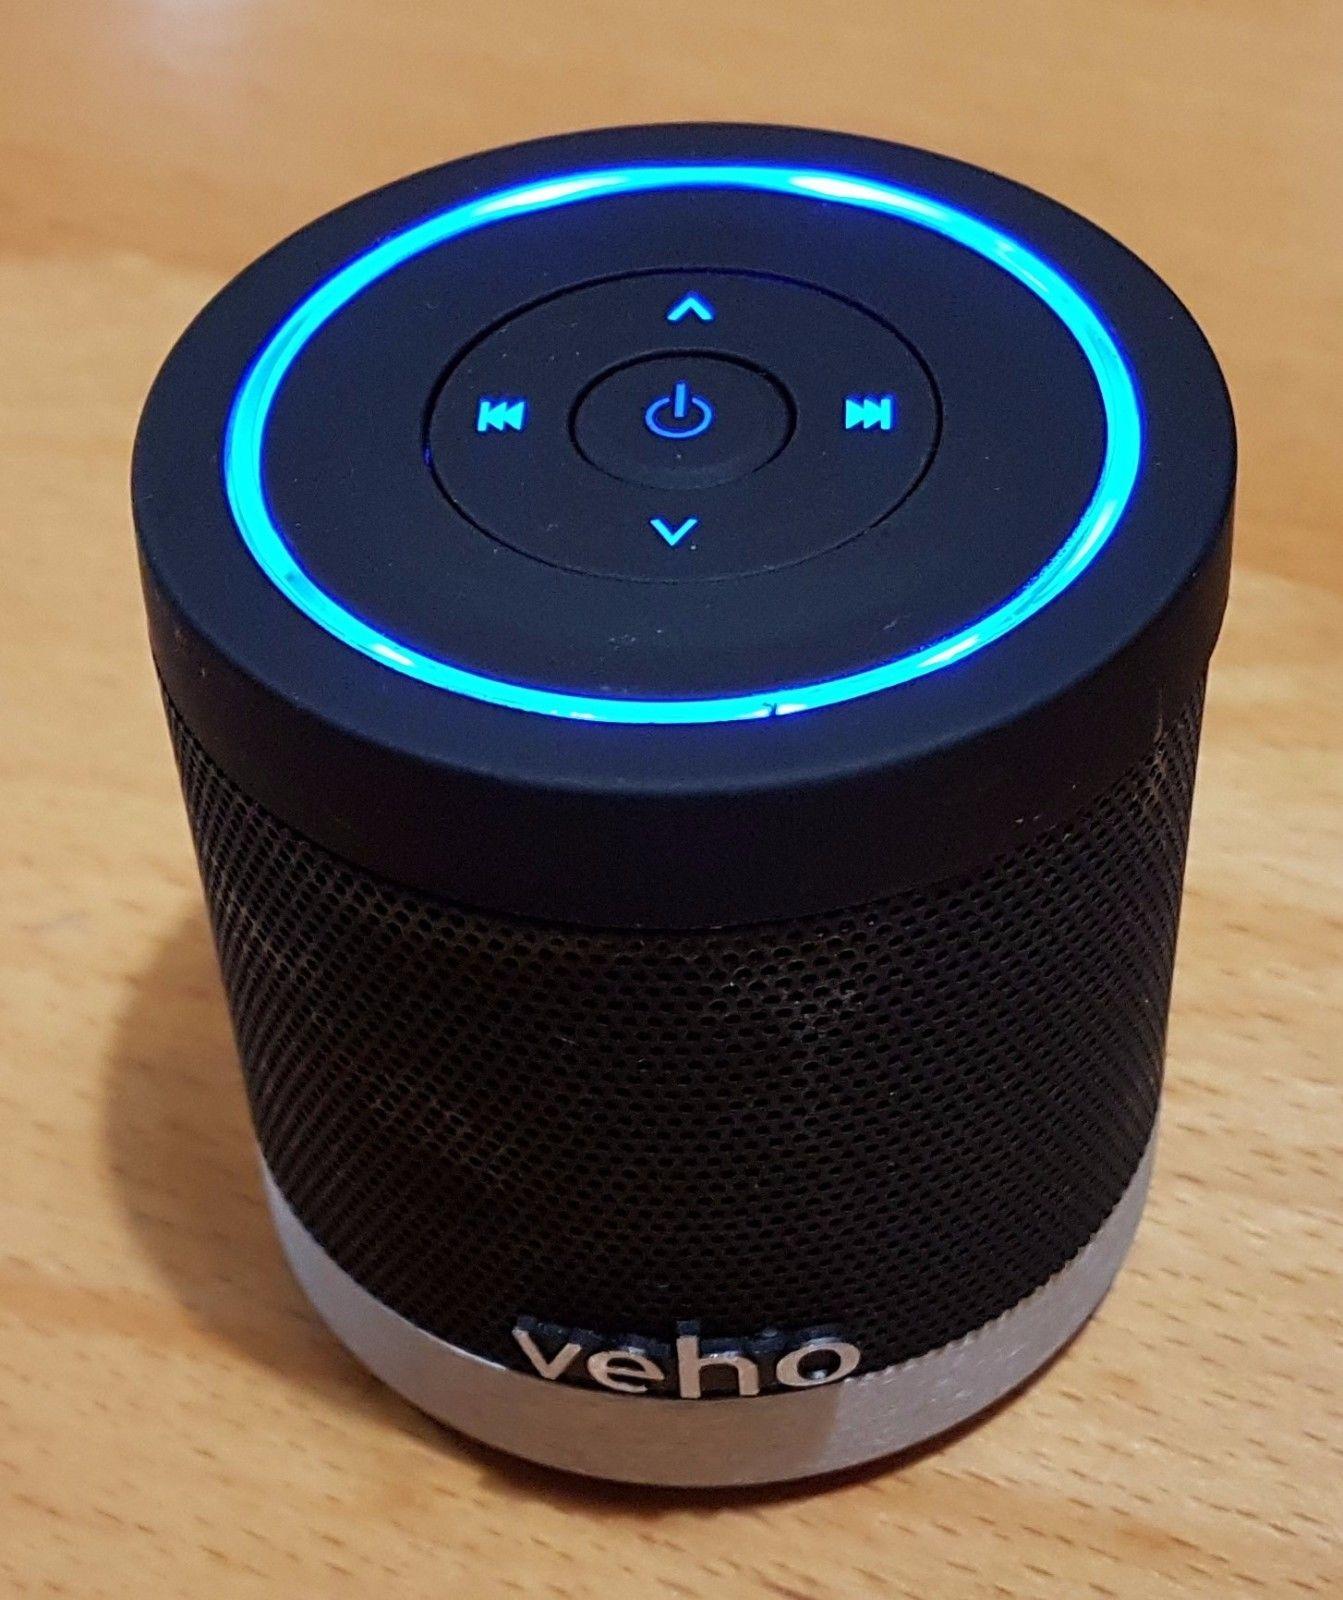 Veho Vss-009-360bt M4 Portable Rechargable Wireless Bluetooth Speaker - best pick £9.99 (seller conway_close) @ eBay